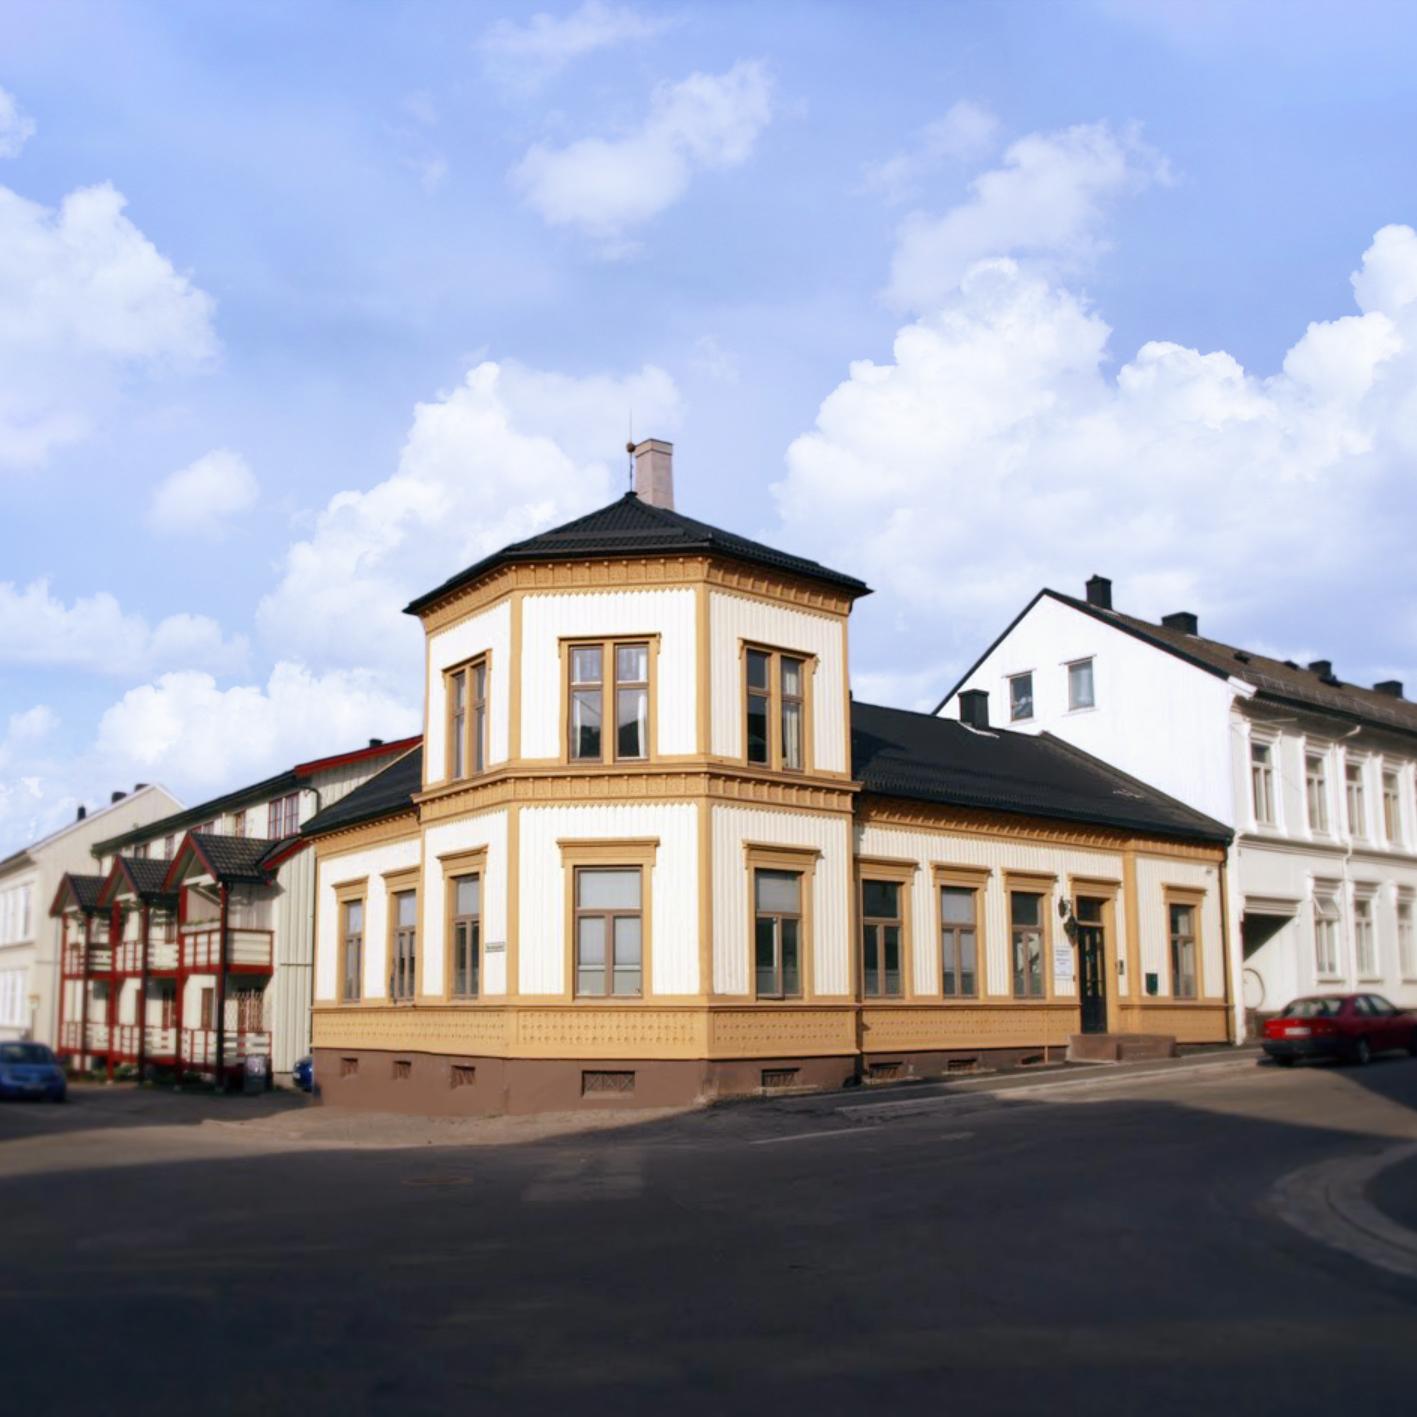 tonsberg.jpg